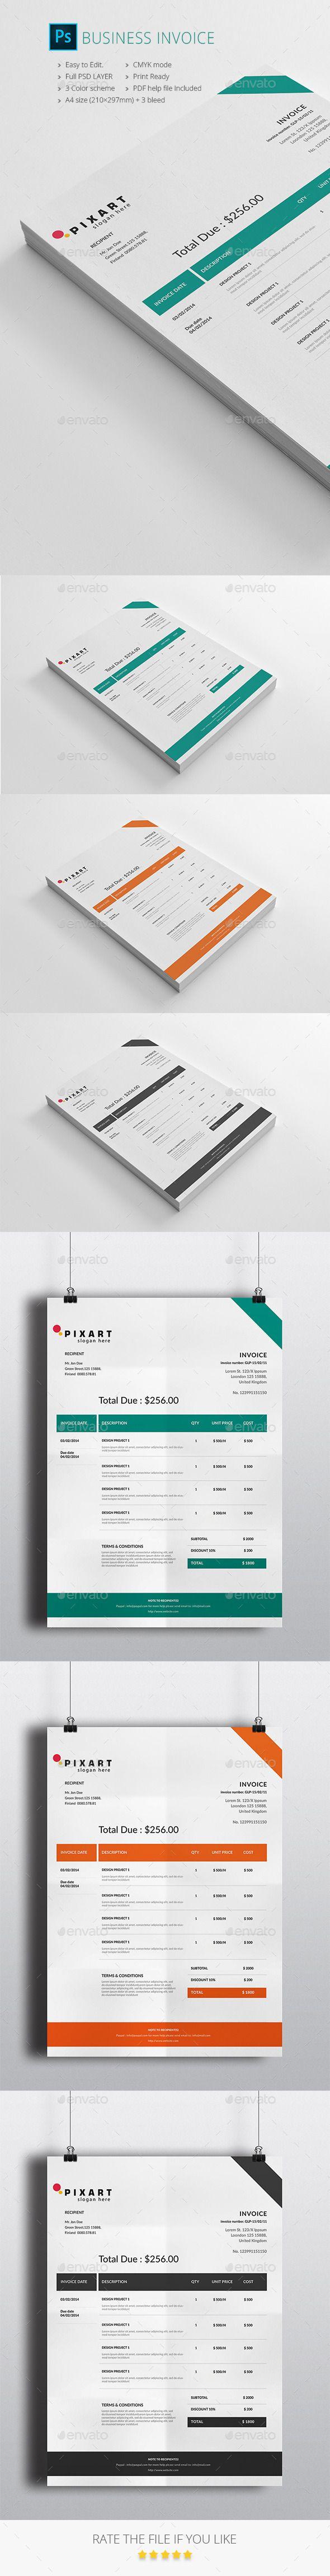 Business Invoice Template PSD #design Download: http://graphicriver.net/item/business-invoice/14013733?ref=ksioks